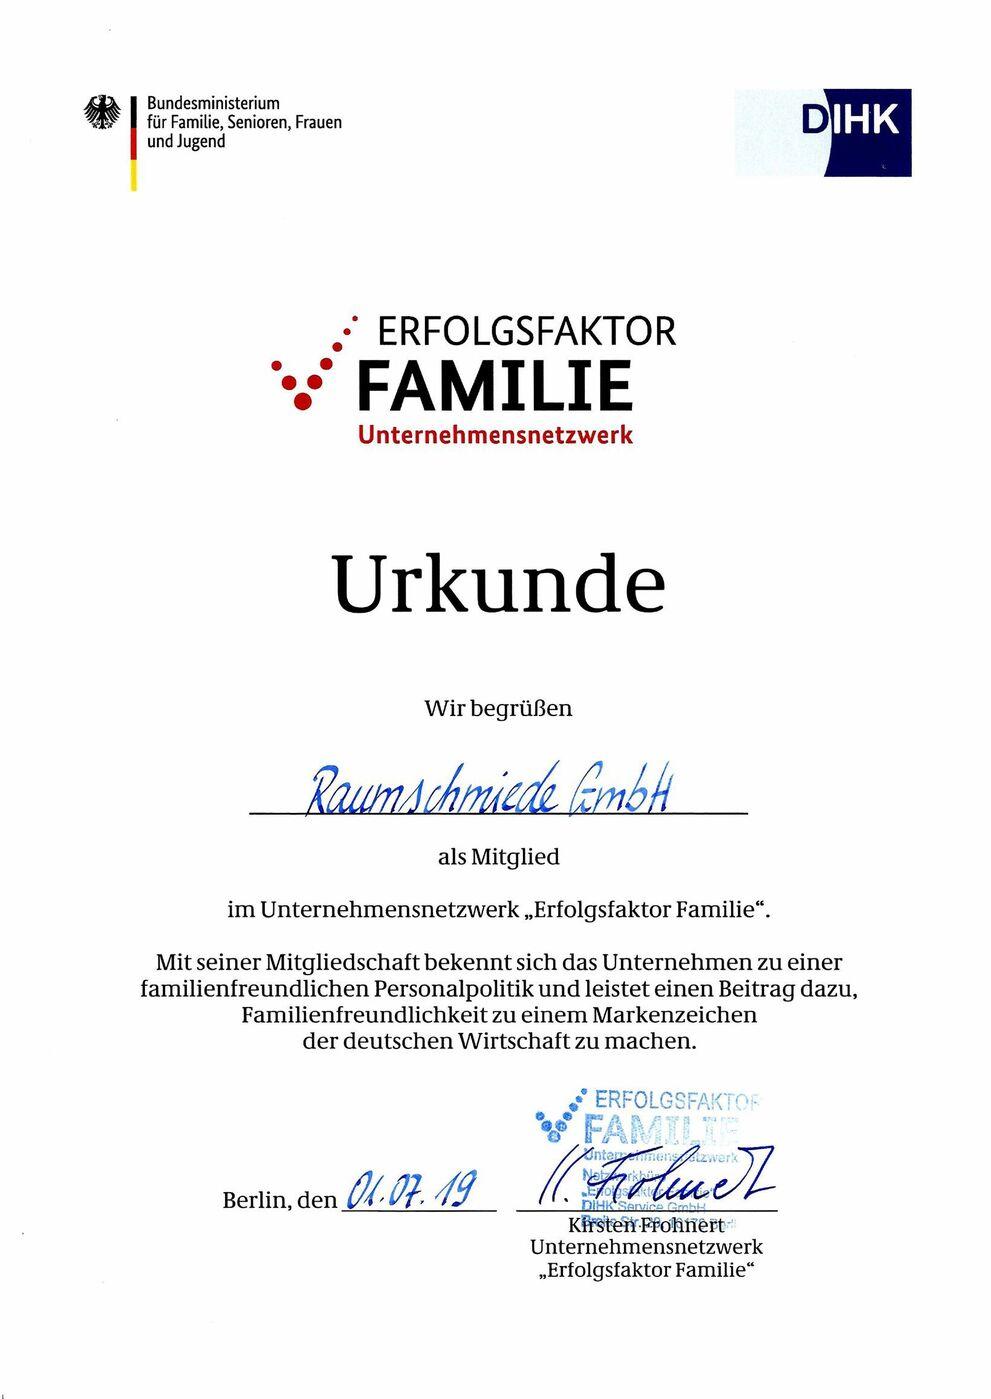 Zertifikat des Erfolgsfaktor Familie